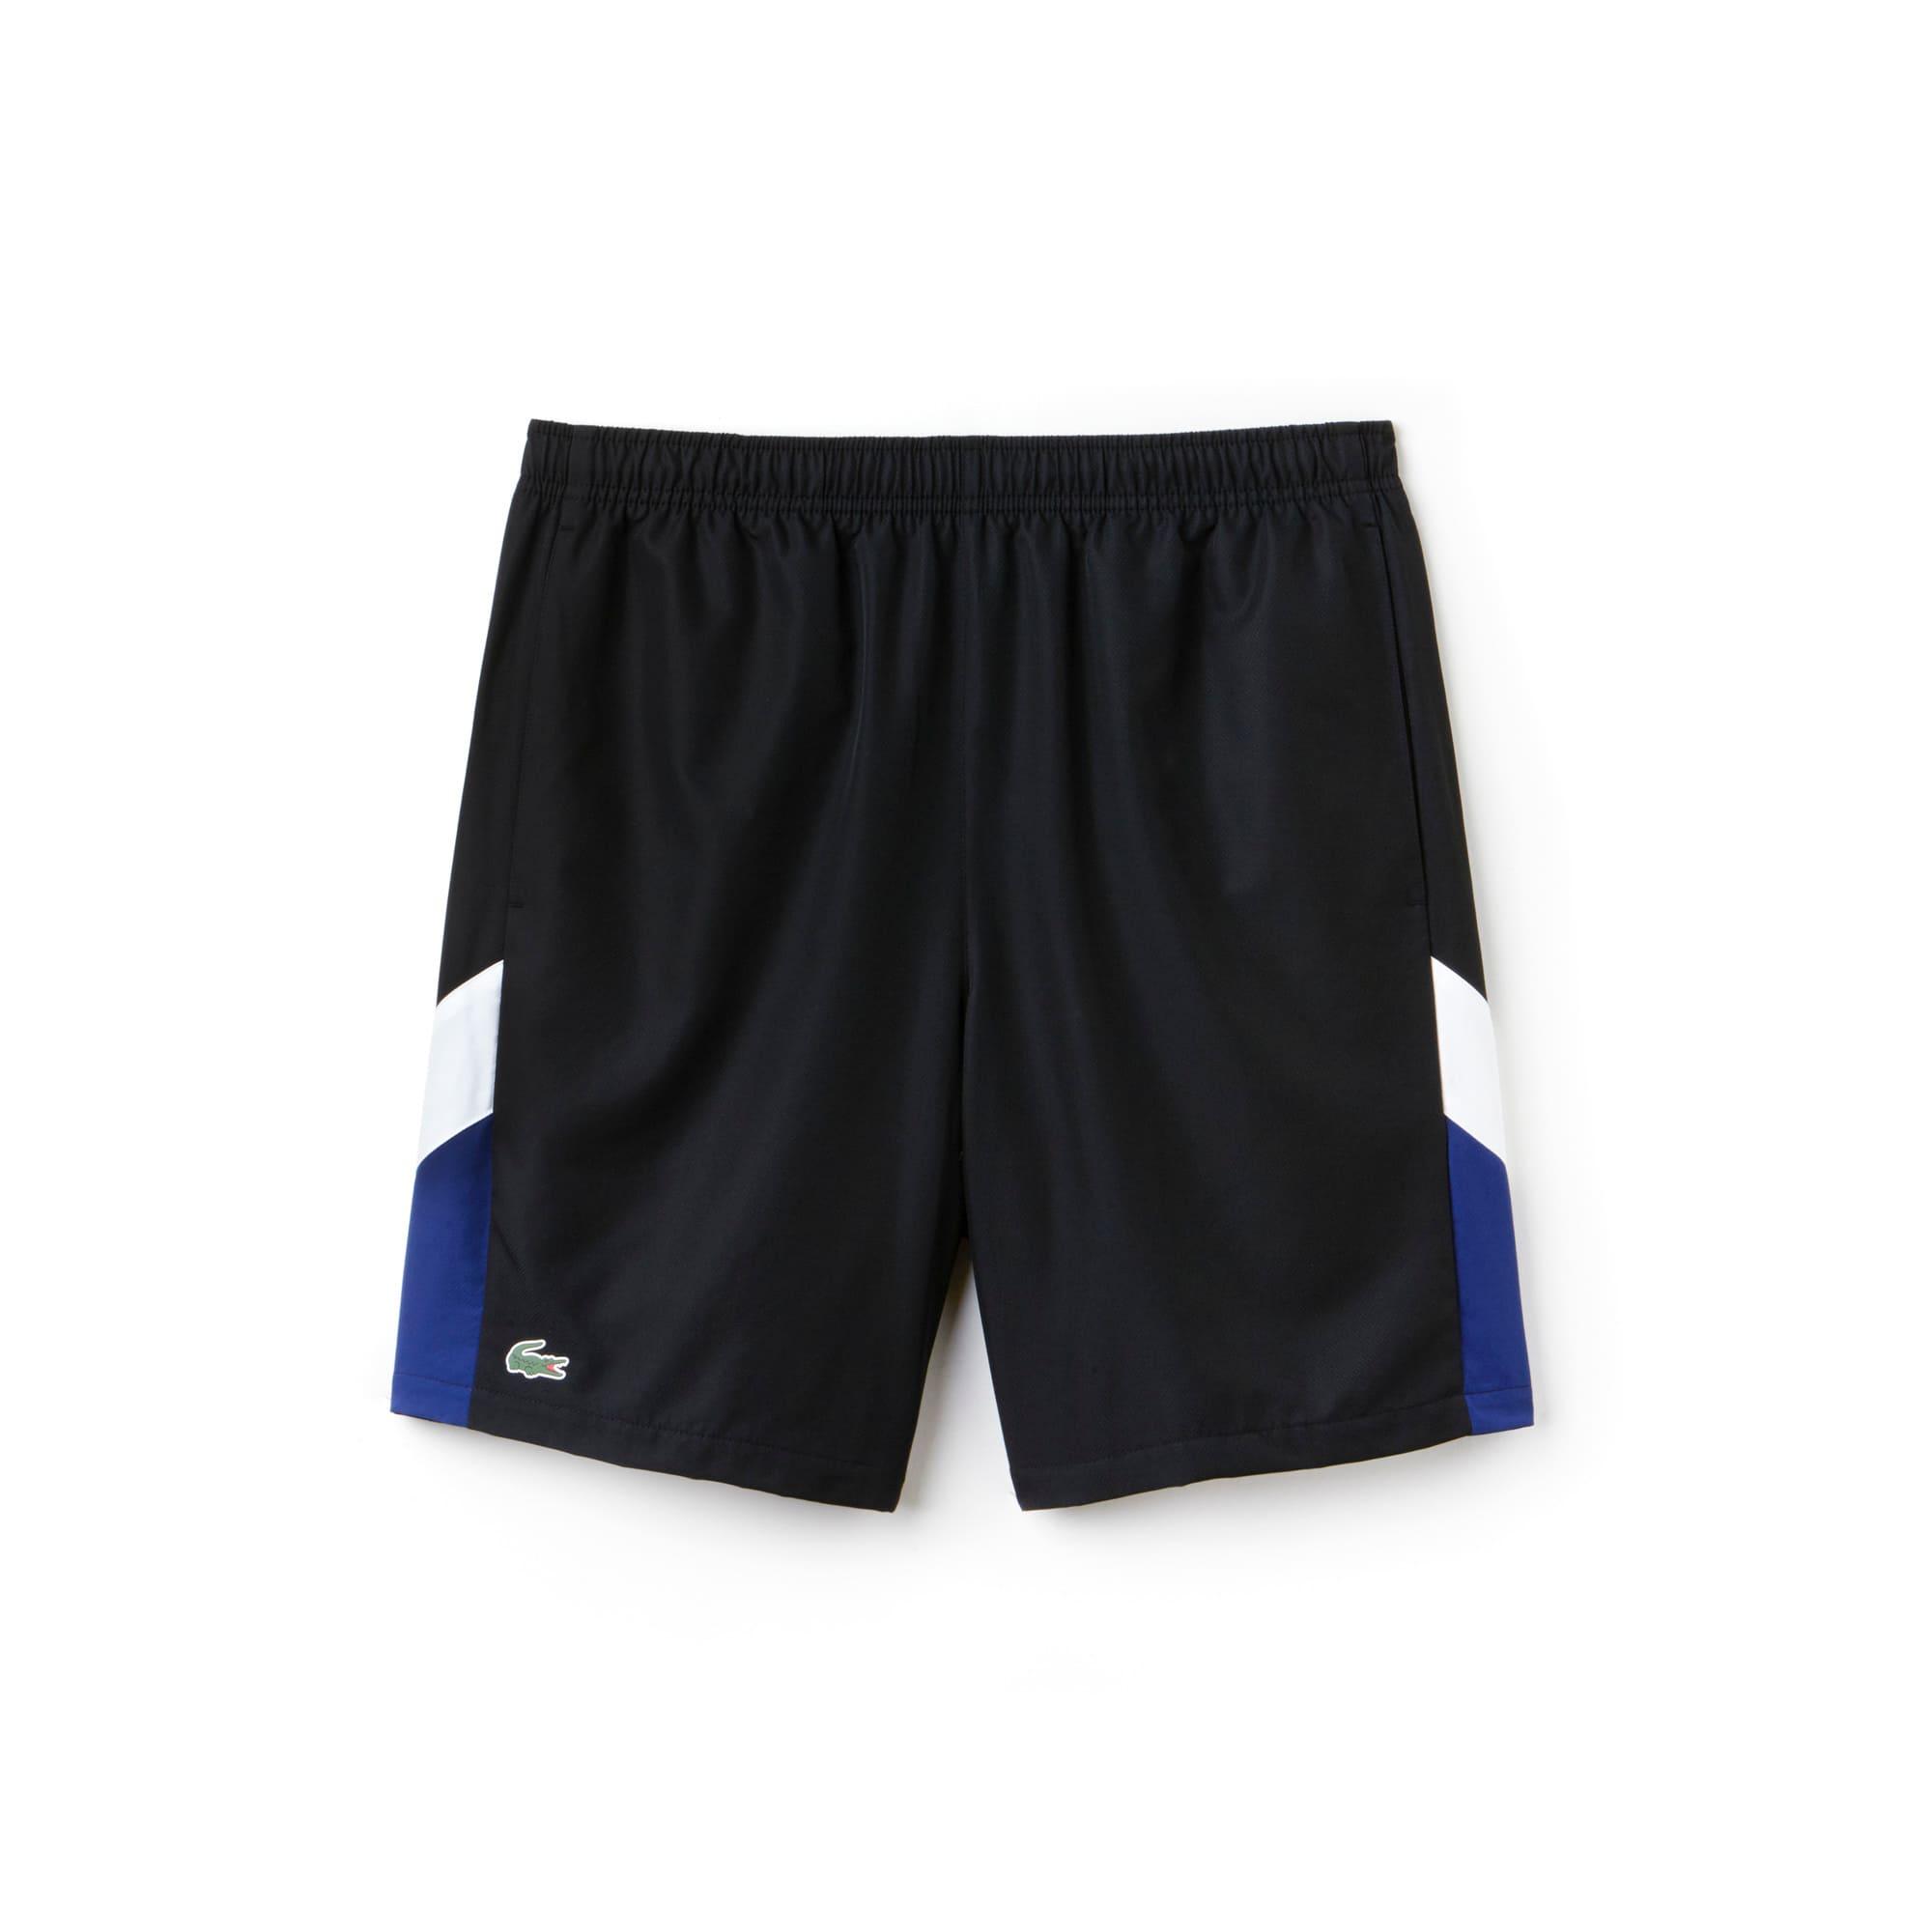 Men's  SPORT Tennis Colorblock Band Shorts